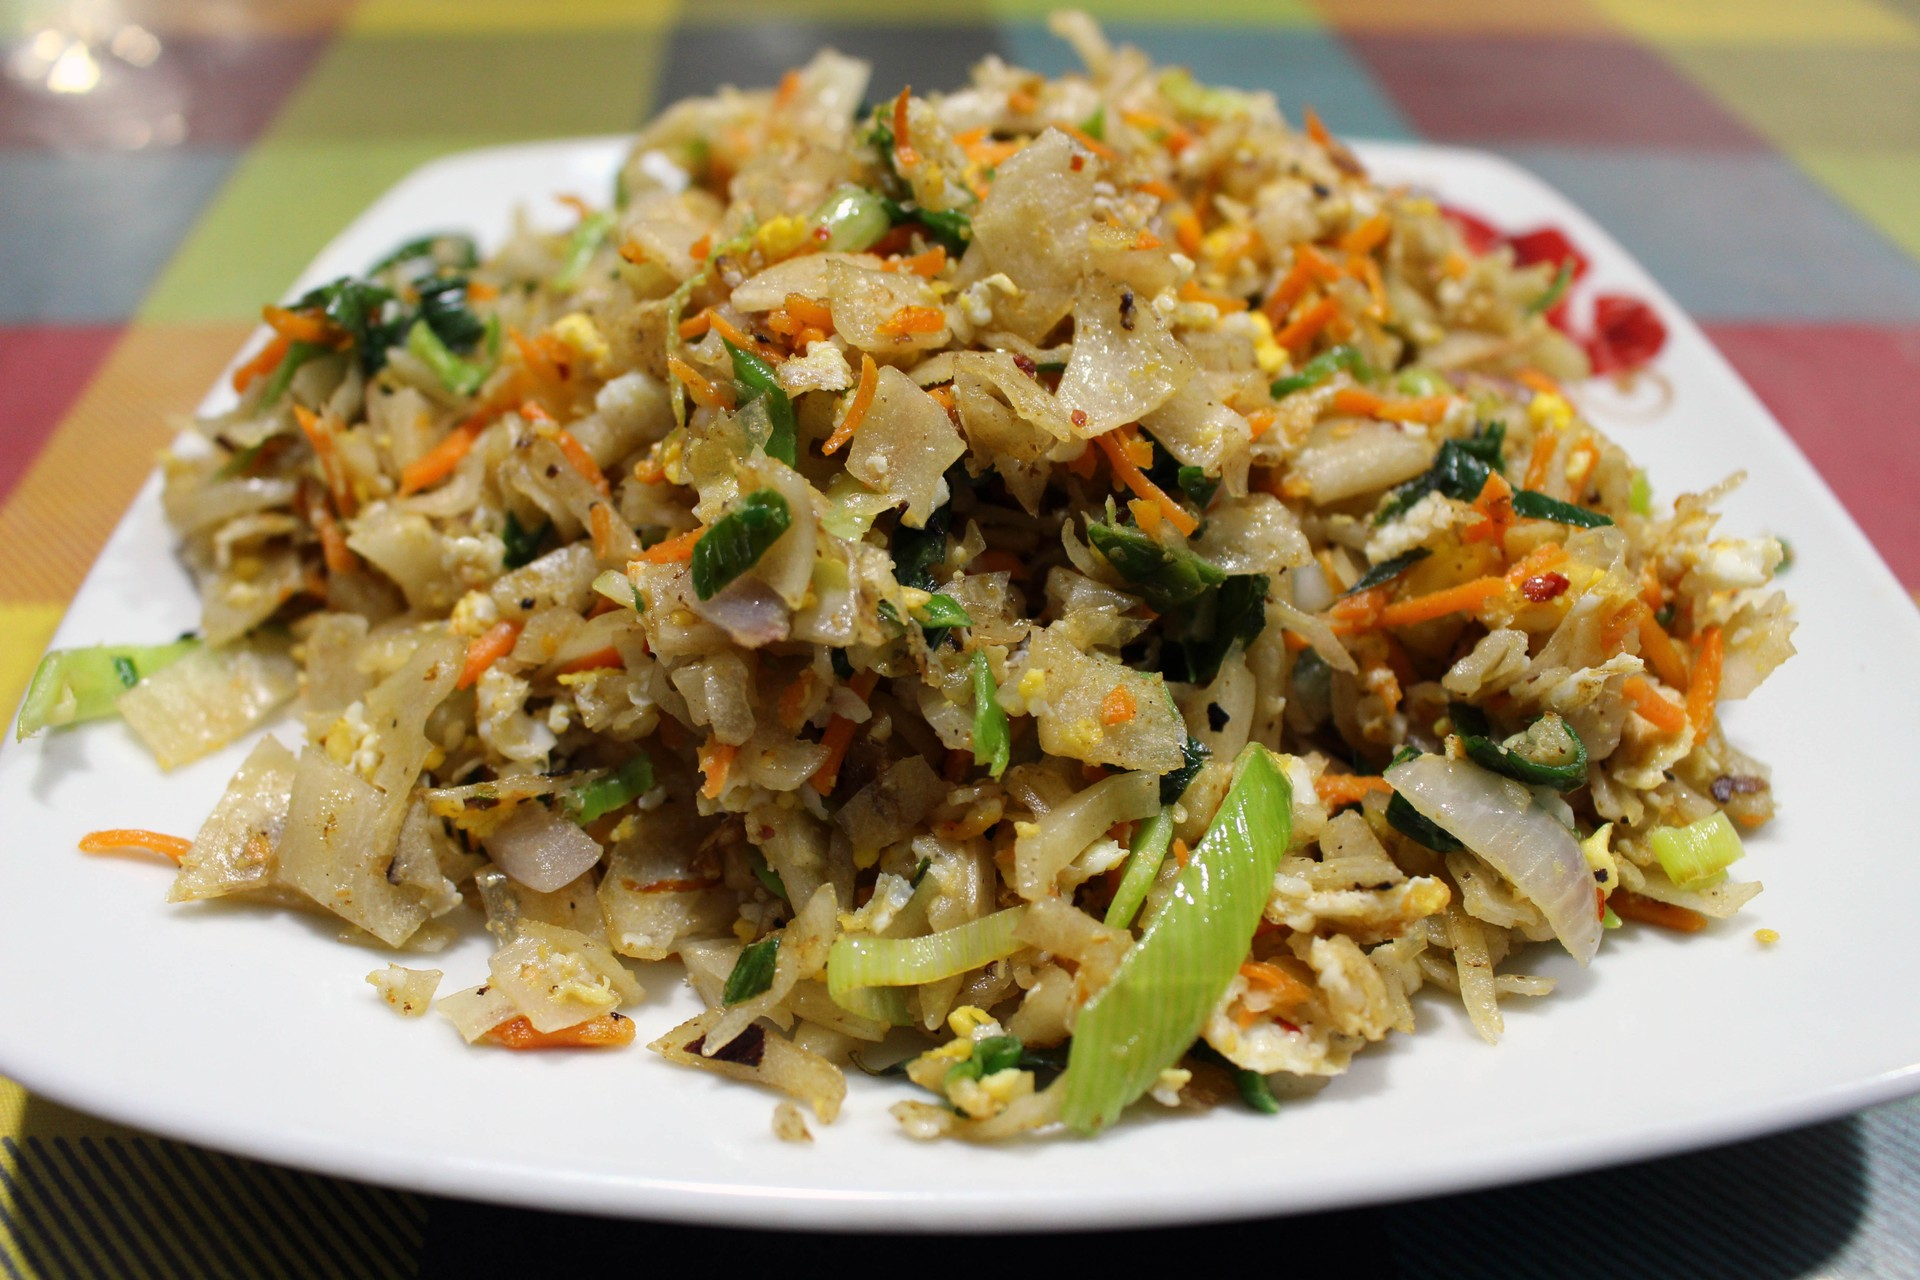 Sri Lanka food tour - kottu roti